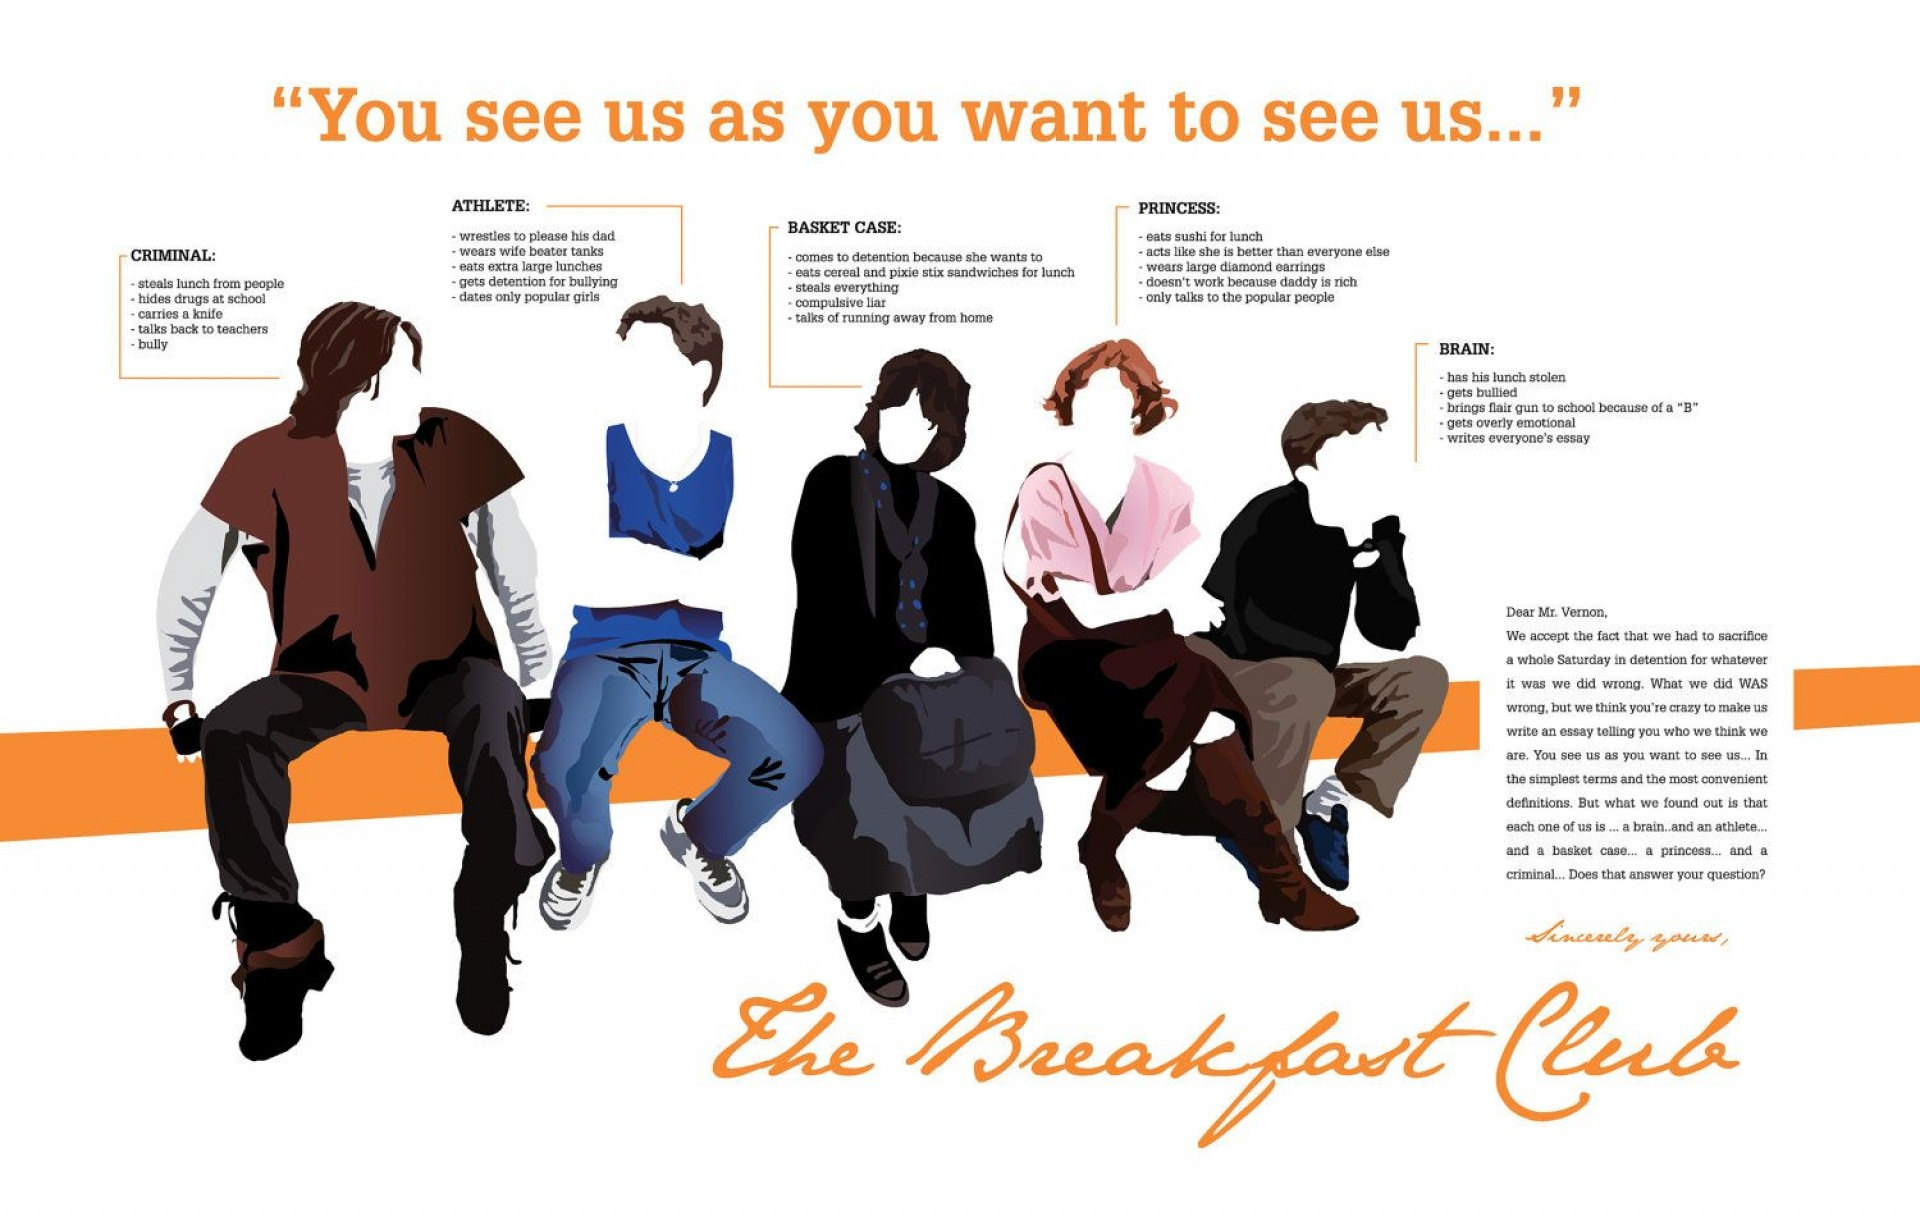 015 Essay Example The Breakfast Breathtaking Club Scene Introduction Analysis 1920